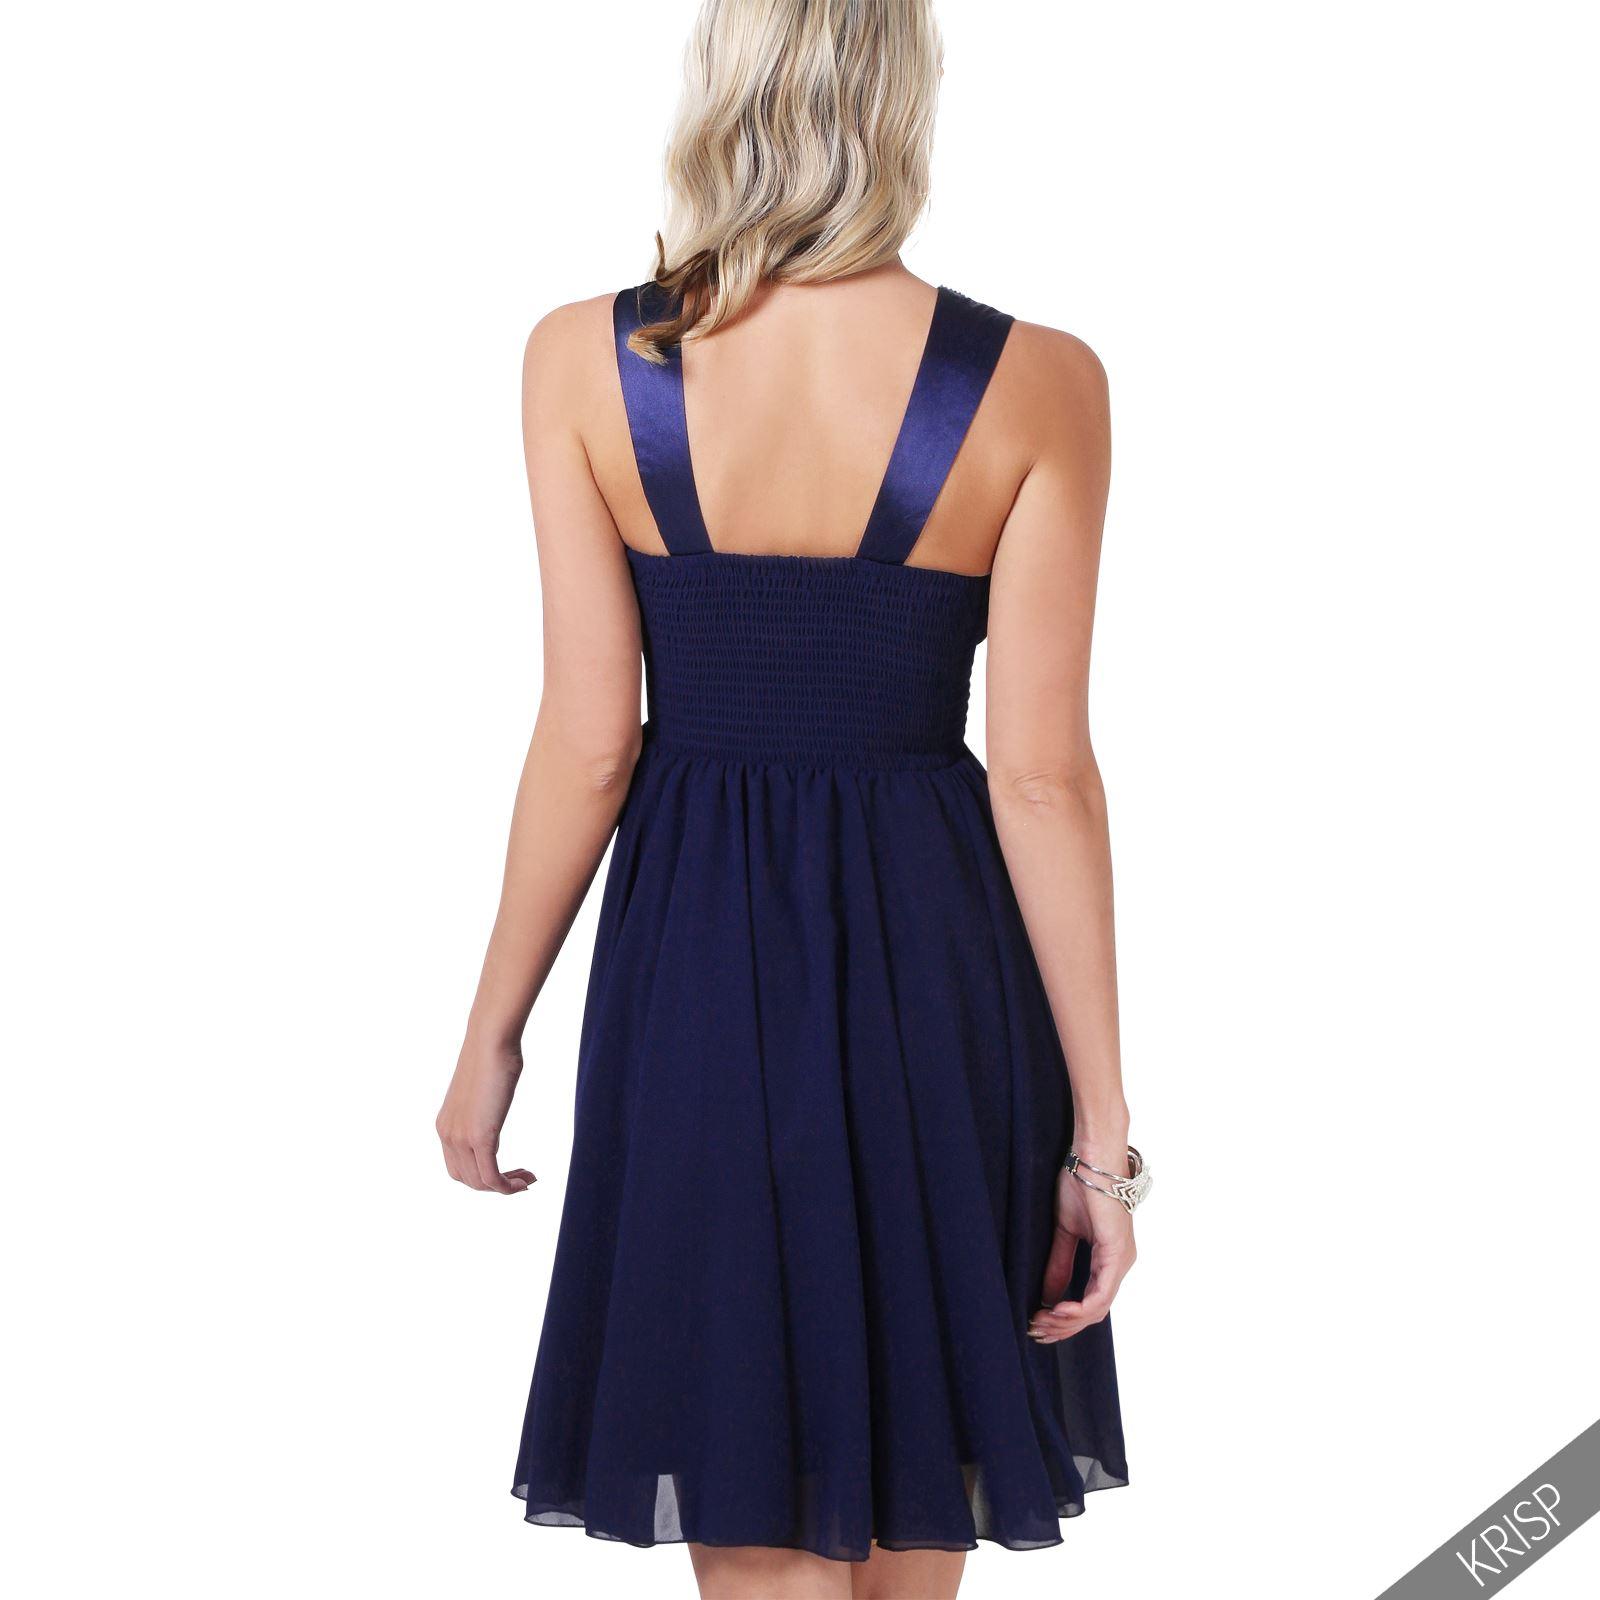 femmes robe soir e empire evas e tenue f te strass brillant promo jupe patineuse ebay. Black Bedroom Furniture Sets. Home Design Ideas